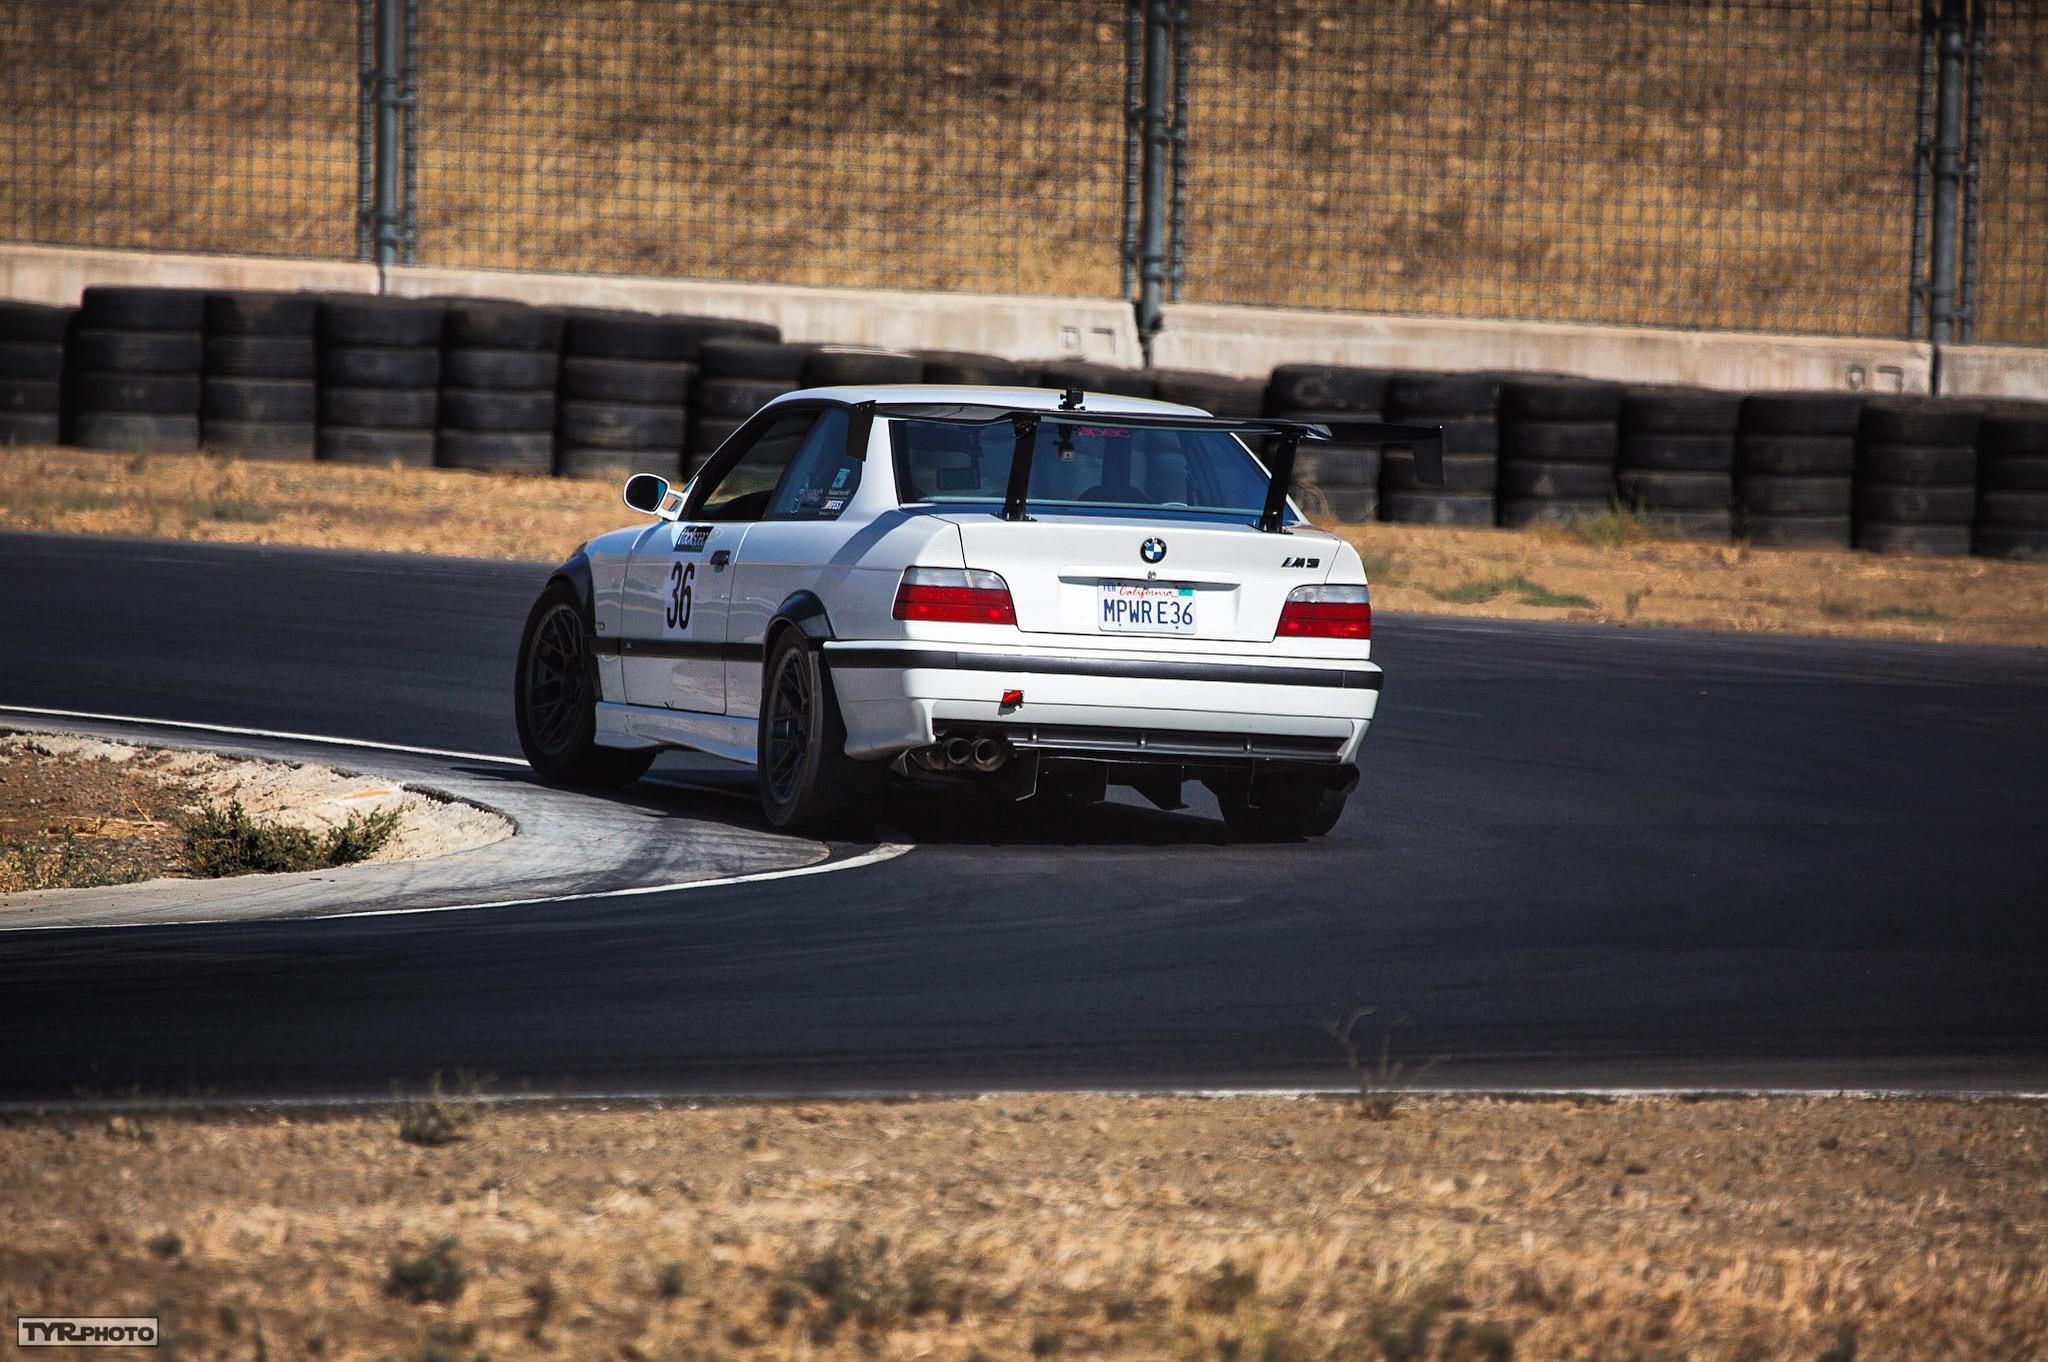 Bobby S Bmw E36 M3 With Apex Arc 8 Wheels Apex Race Parts Blog